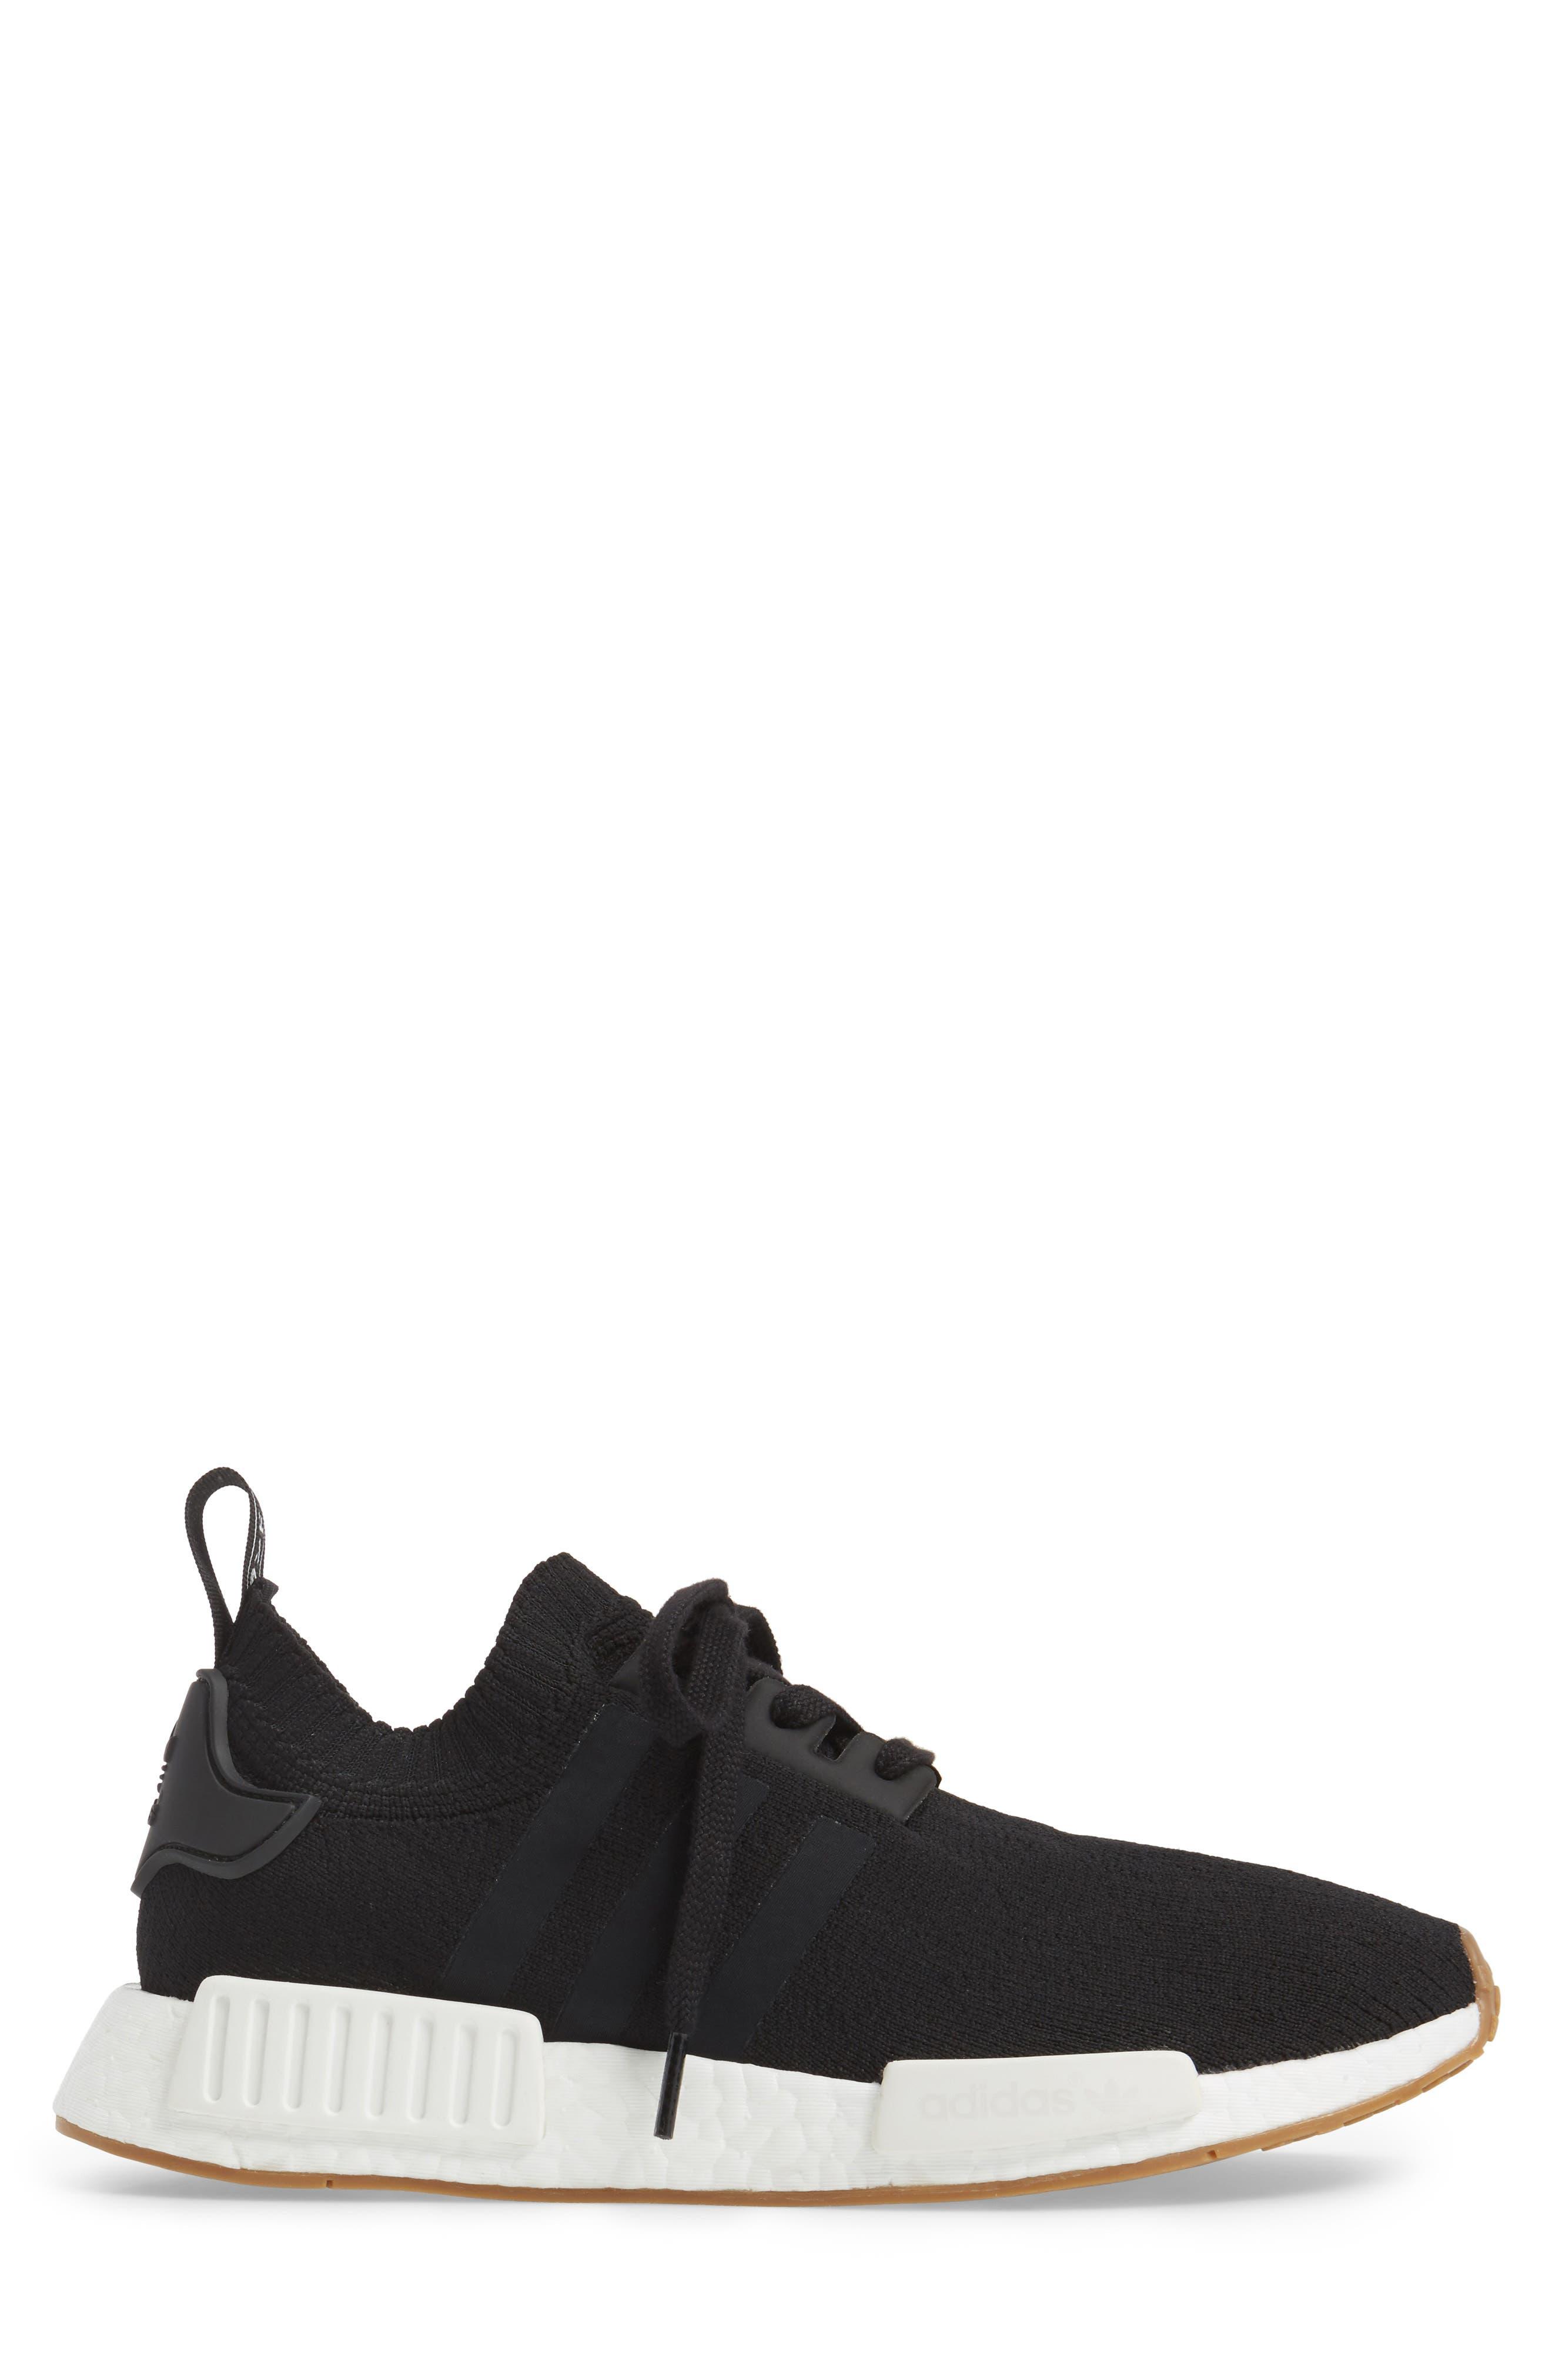 NMD R1 Primeknit Sneaker,                             Alternate thumbnail 3, color,                             002